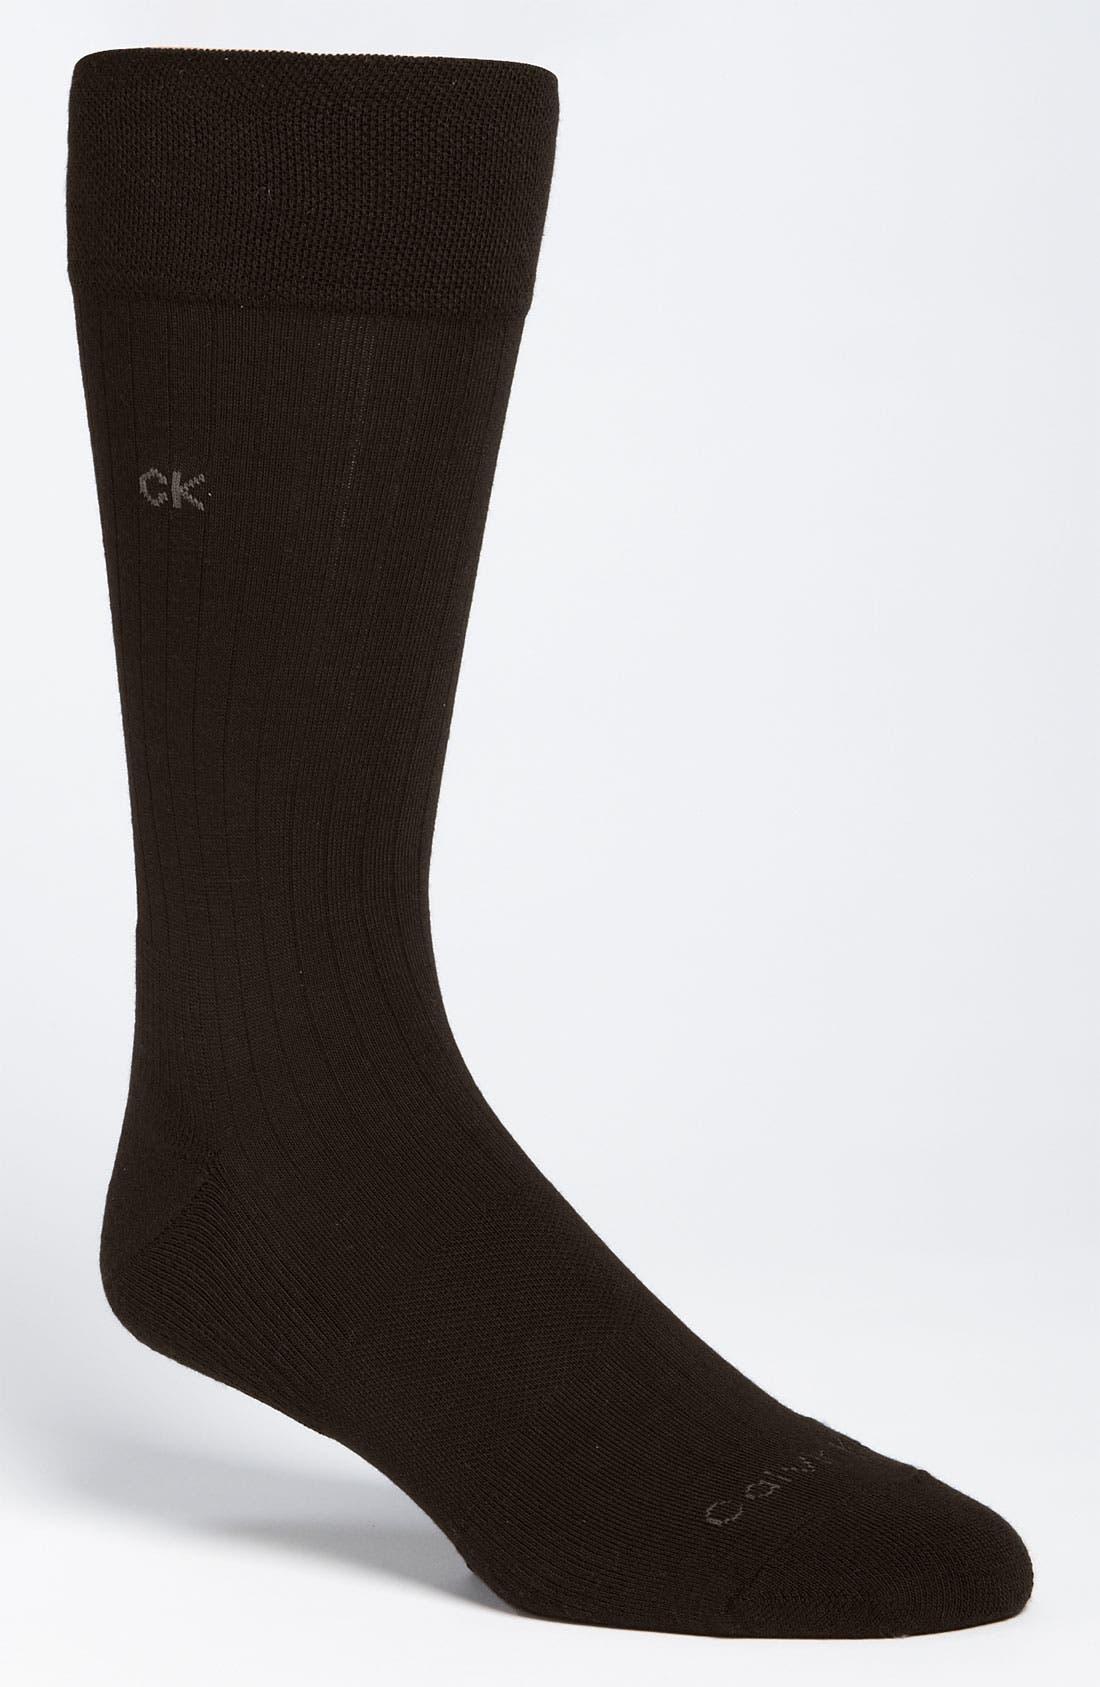 Alternate Image 1 Selected - Calvin Klein 'Ultra Fit' Socks